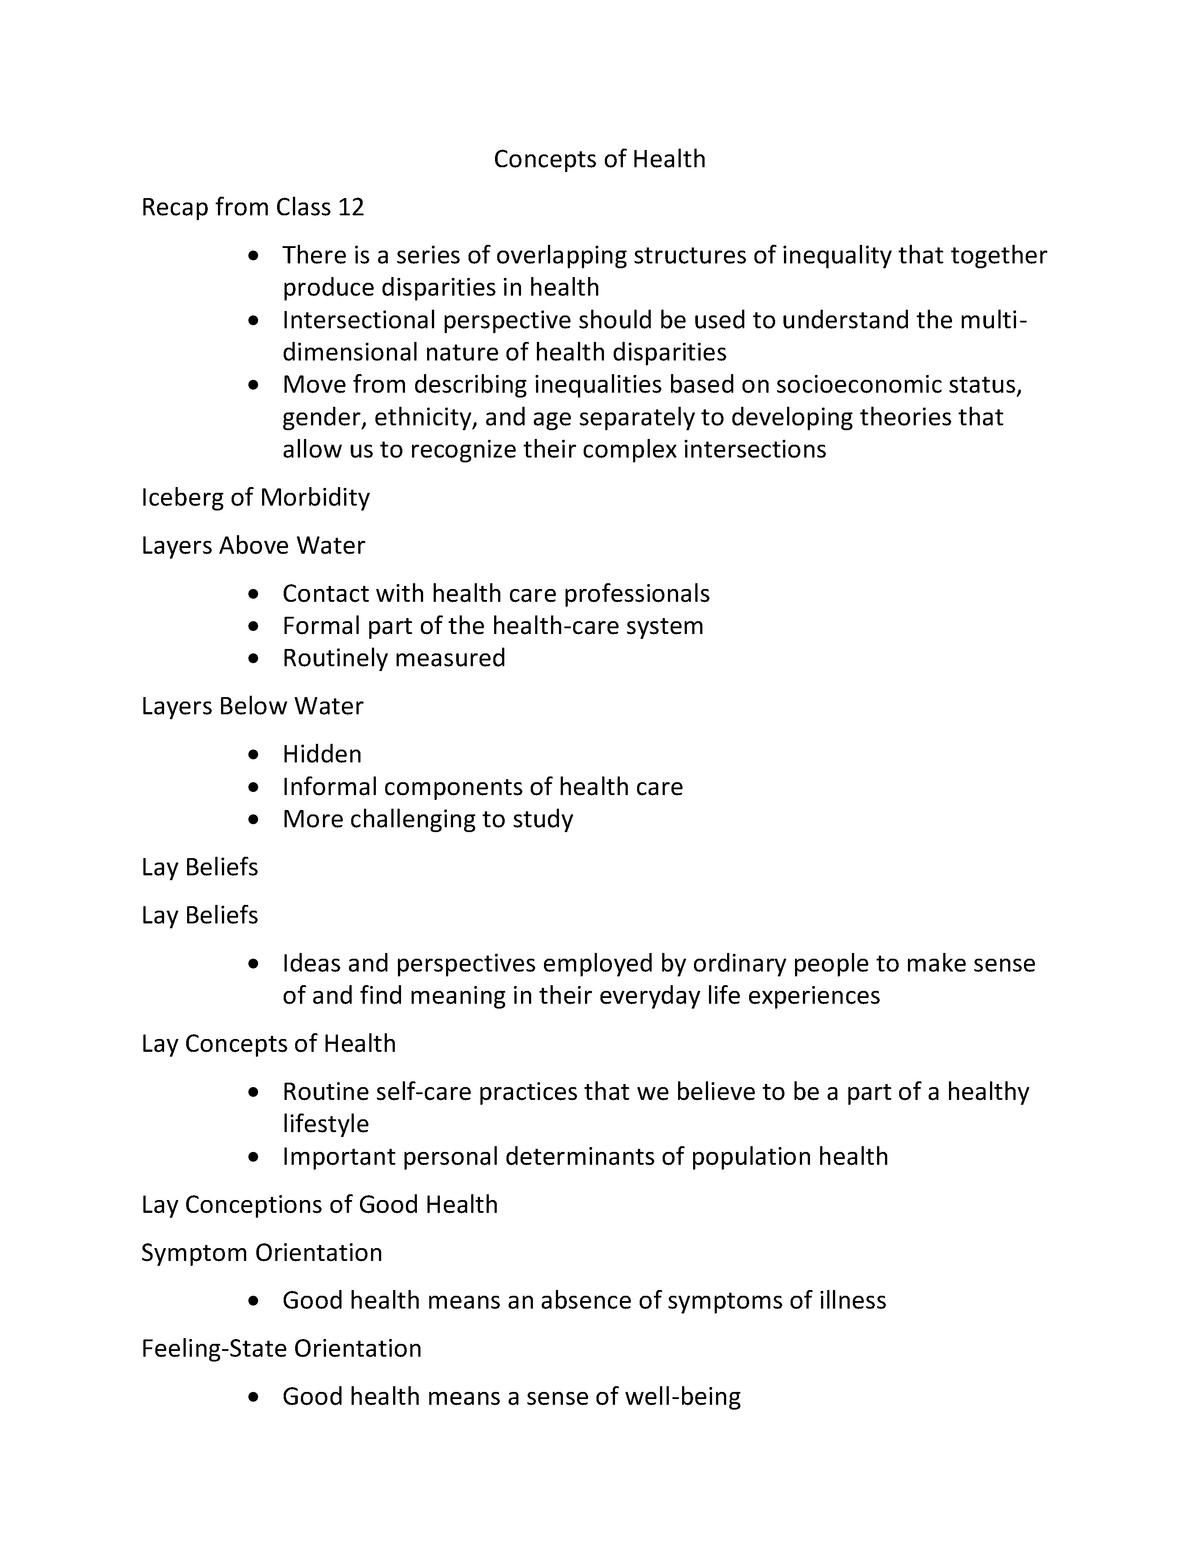 Concepts of Health - NURS1051: Relational Nursing II - StuDocu